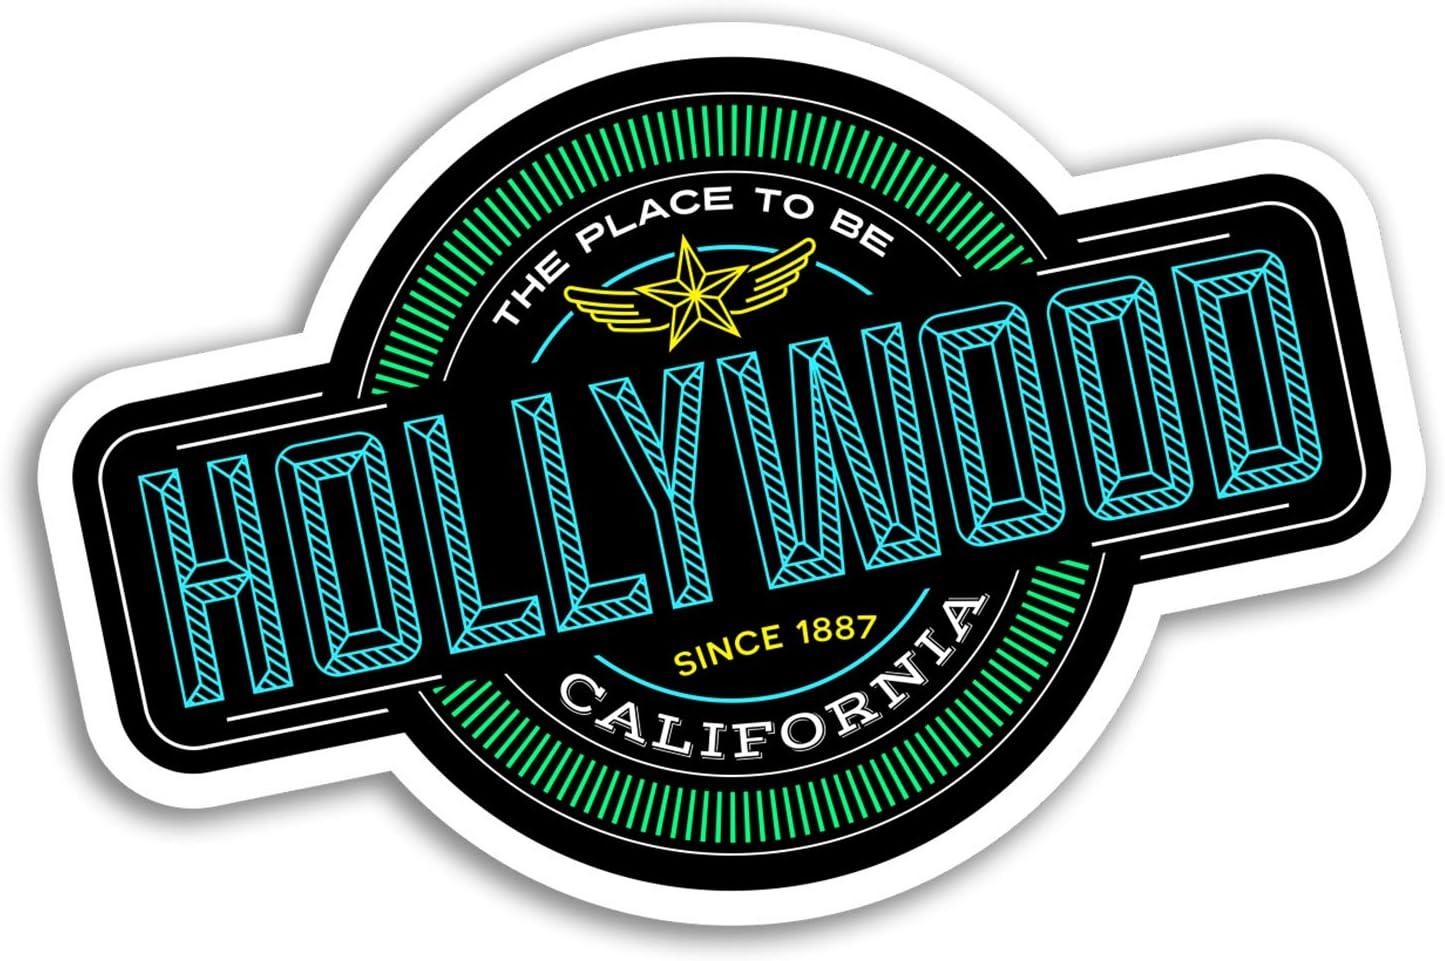 2 x 10cm Hollywood Vinyl Stickers - America USA Sticker Laptop Luggage #17845 (10cm Wide)